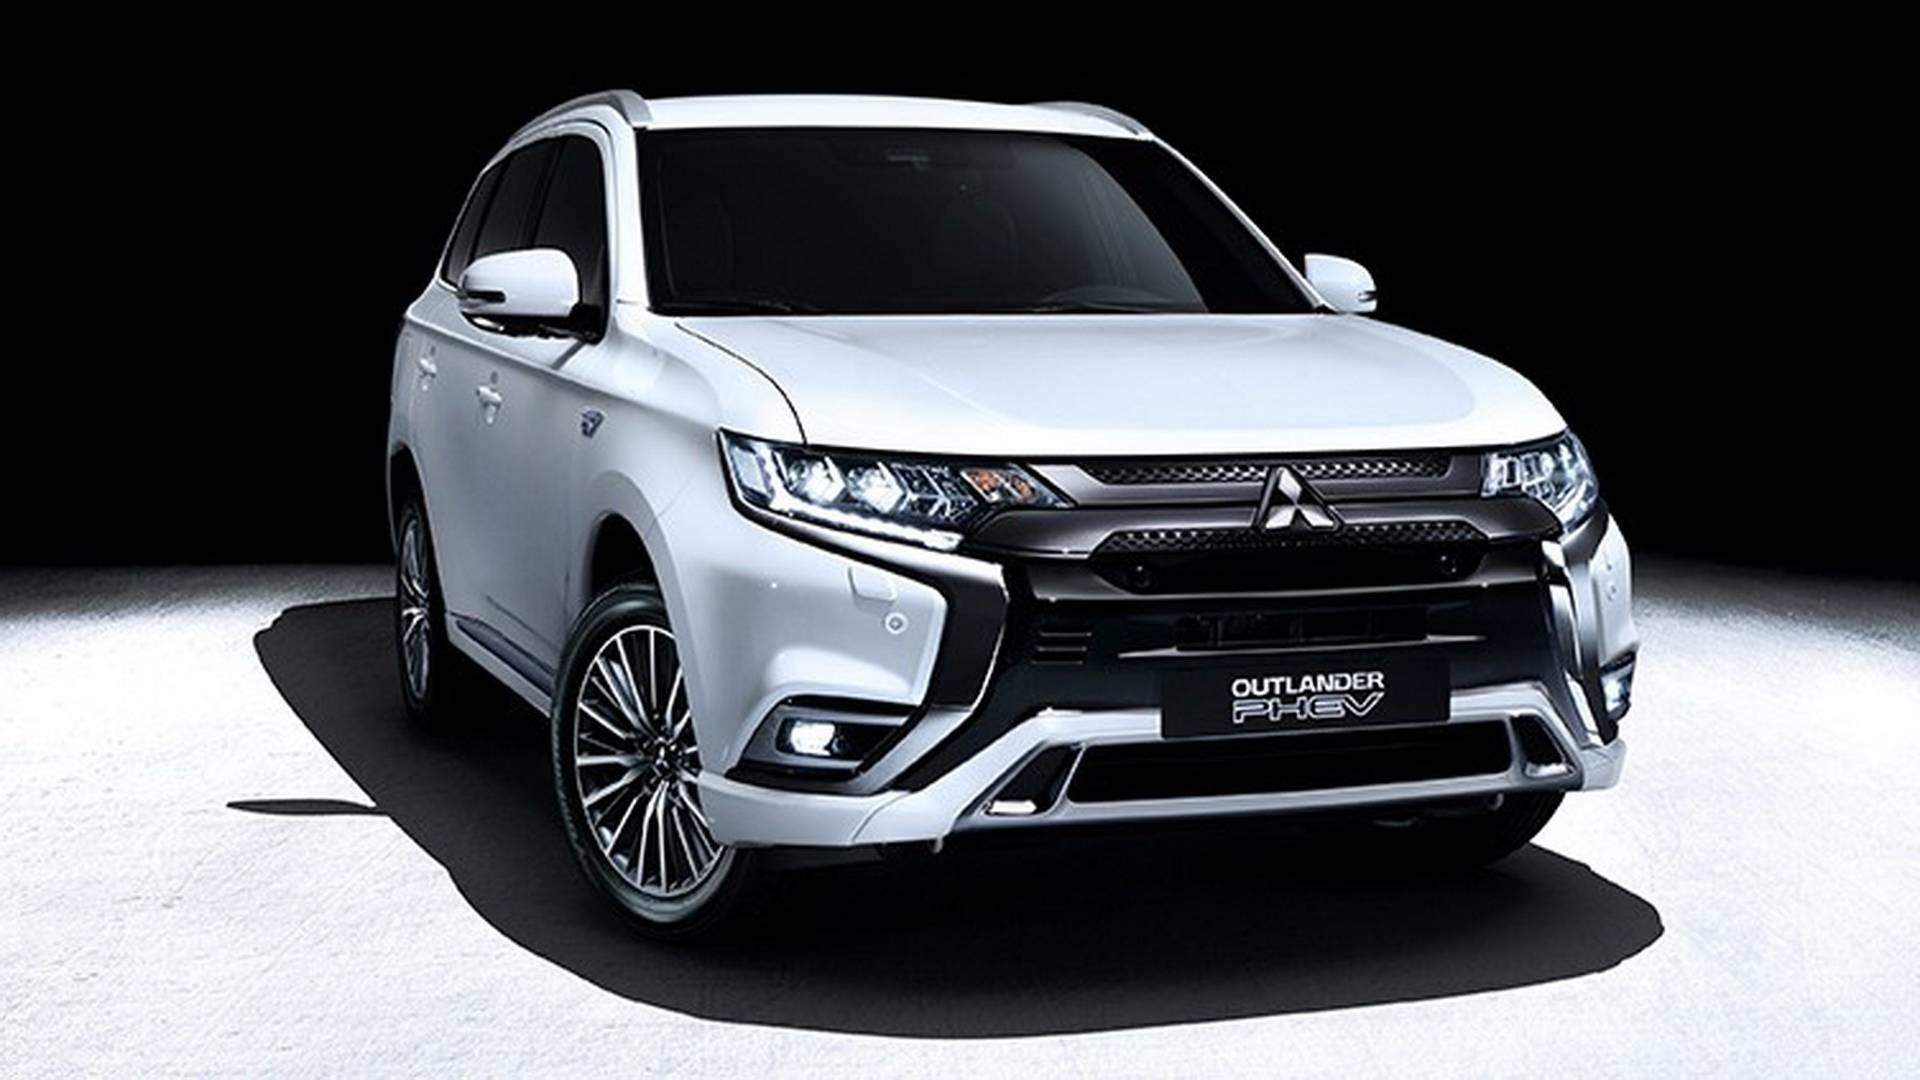 2019 Mitsubishi Outlander Phev Gets Bigger Torquier Engine